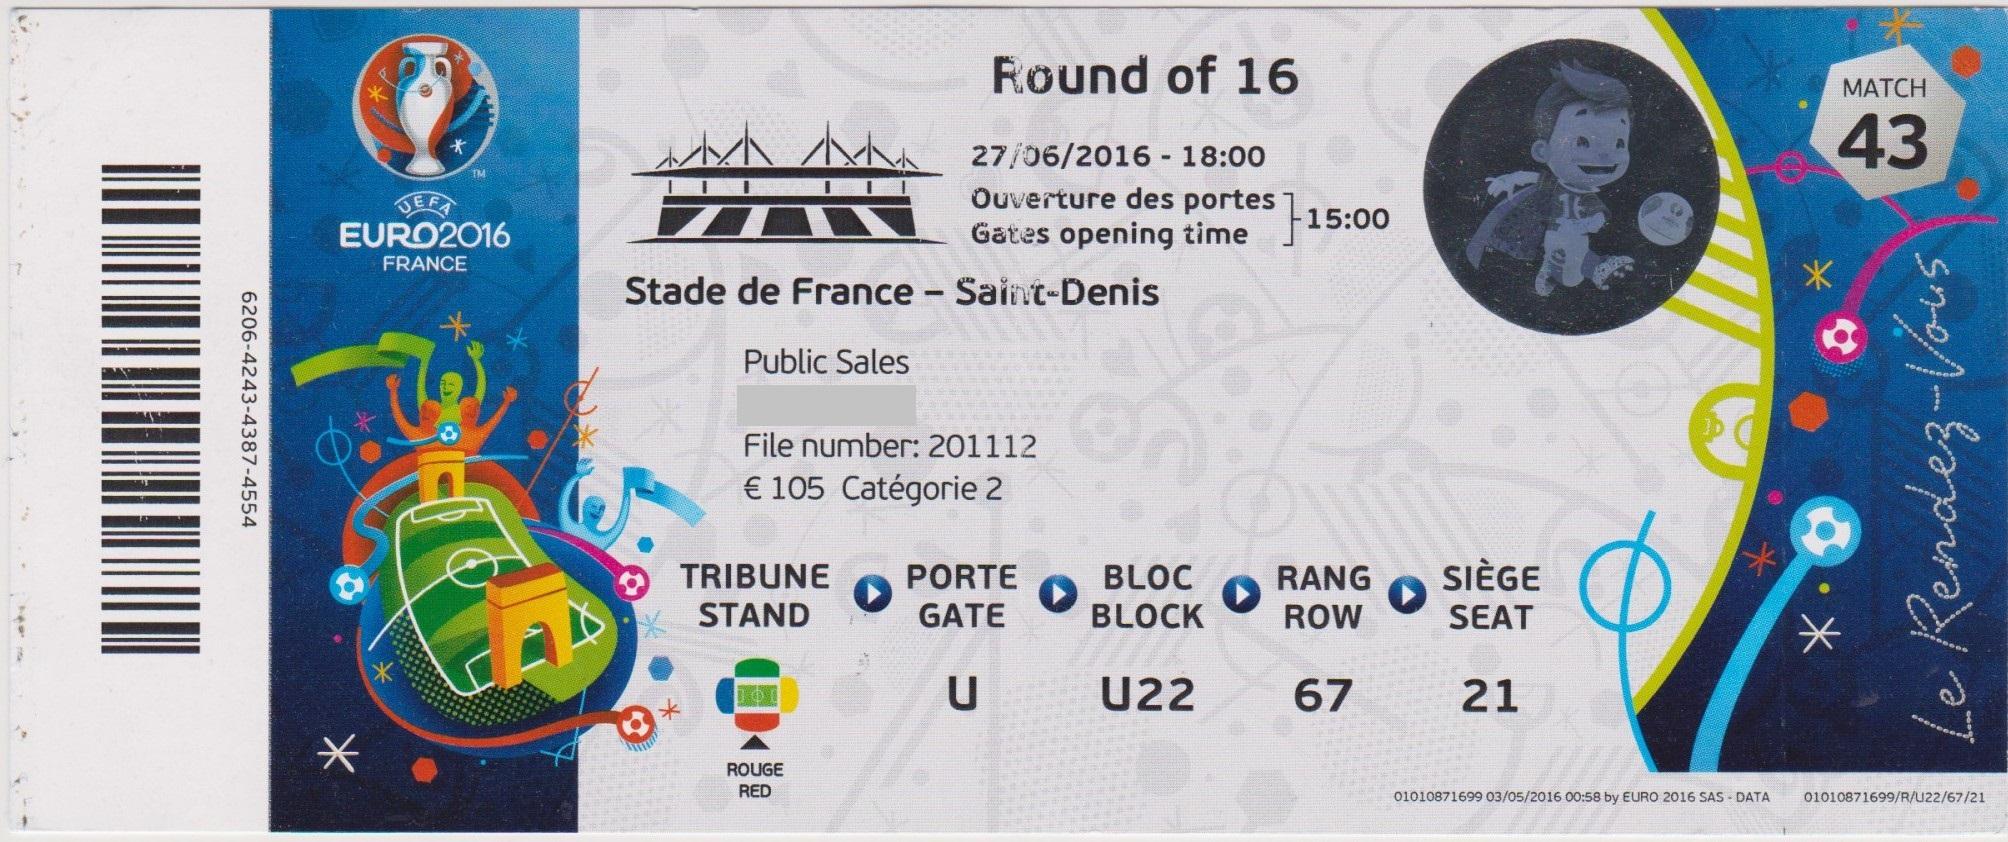 27/06/2016  St Denis :  1/8 Fin  Italie  2 - 0  Espagne  > Chiellini, Pellè (Ita) <